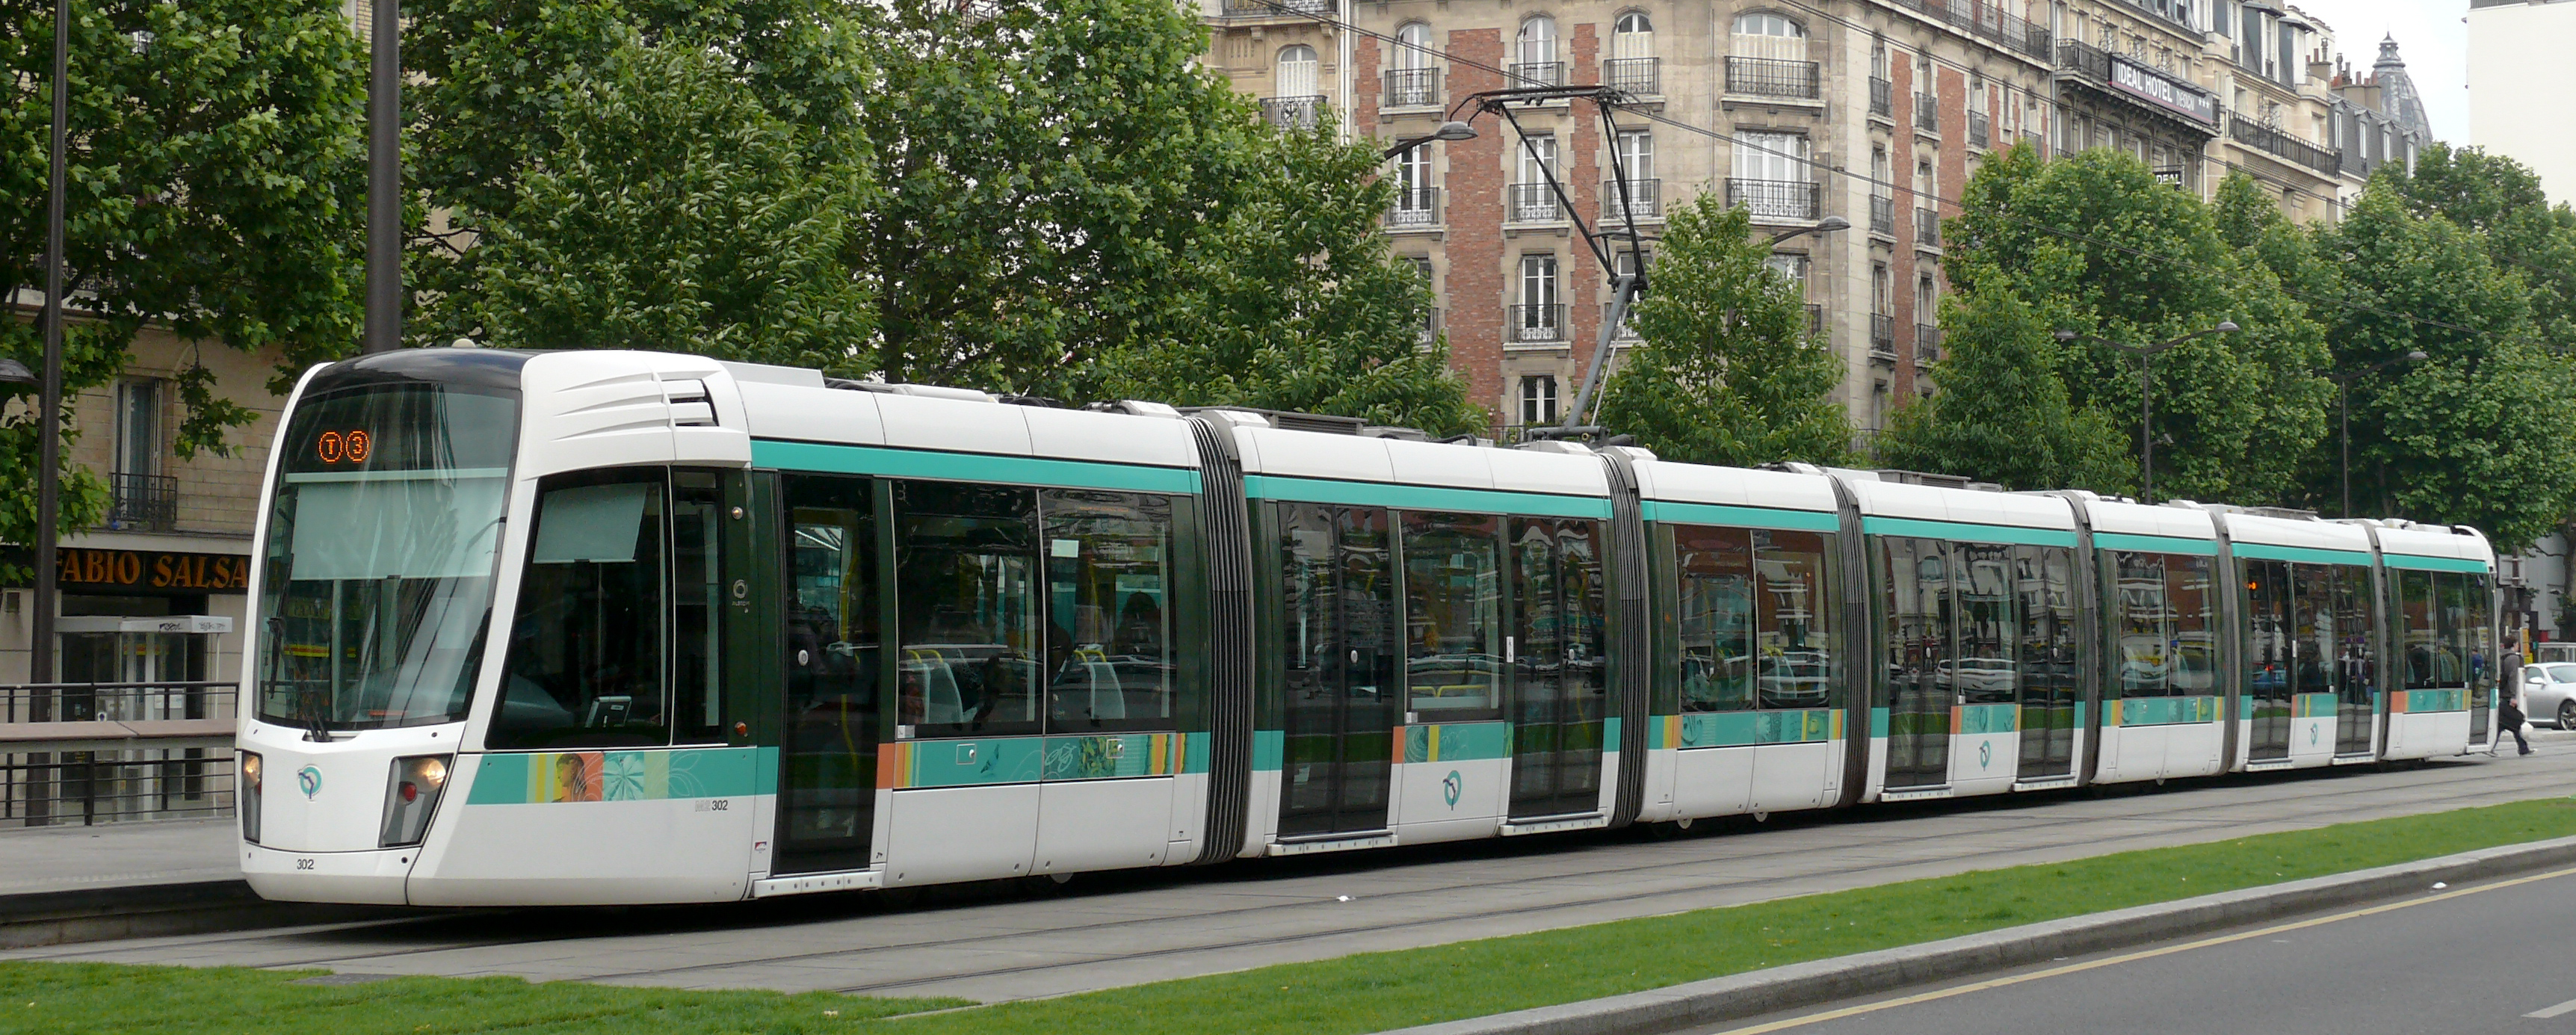 Citadis_Alstom_Paris_T3 (wiki)